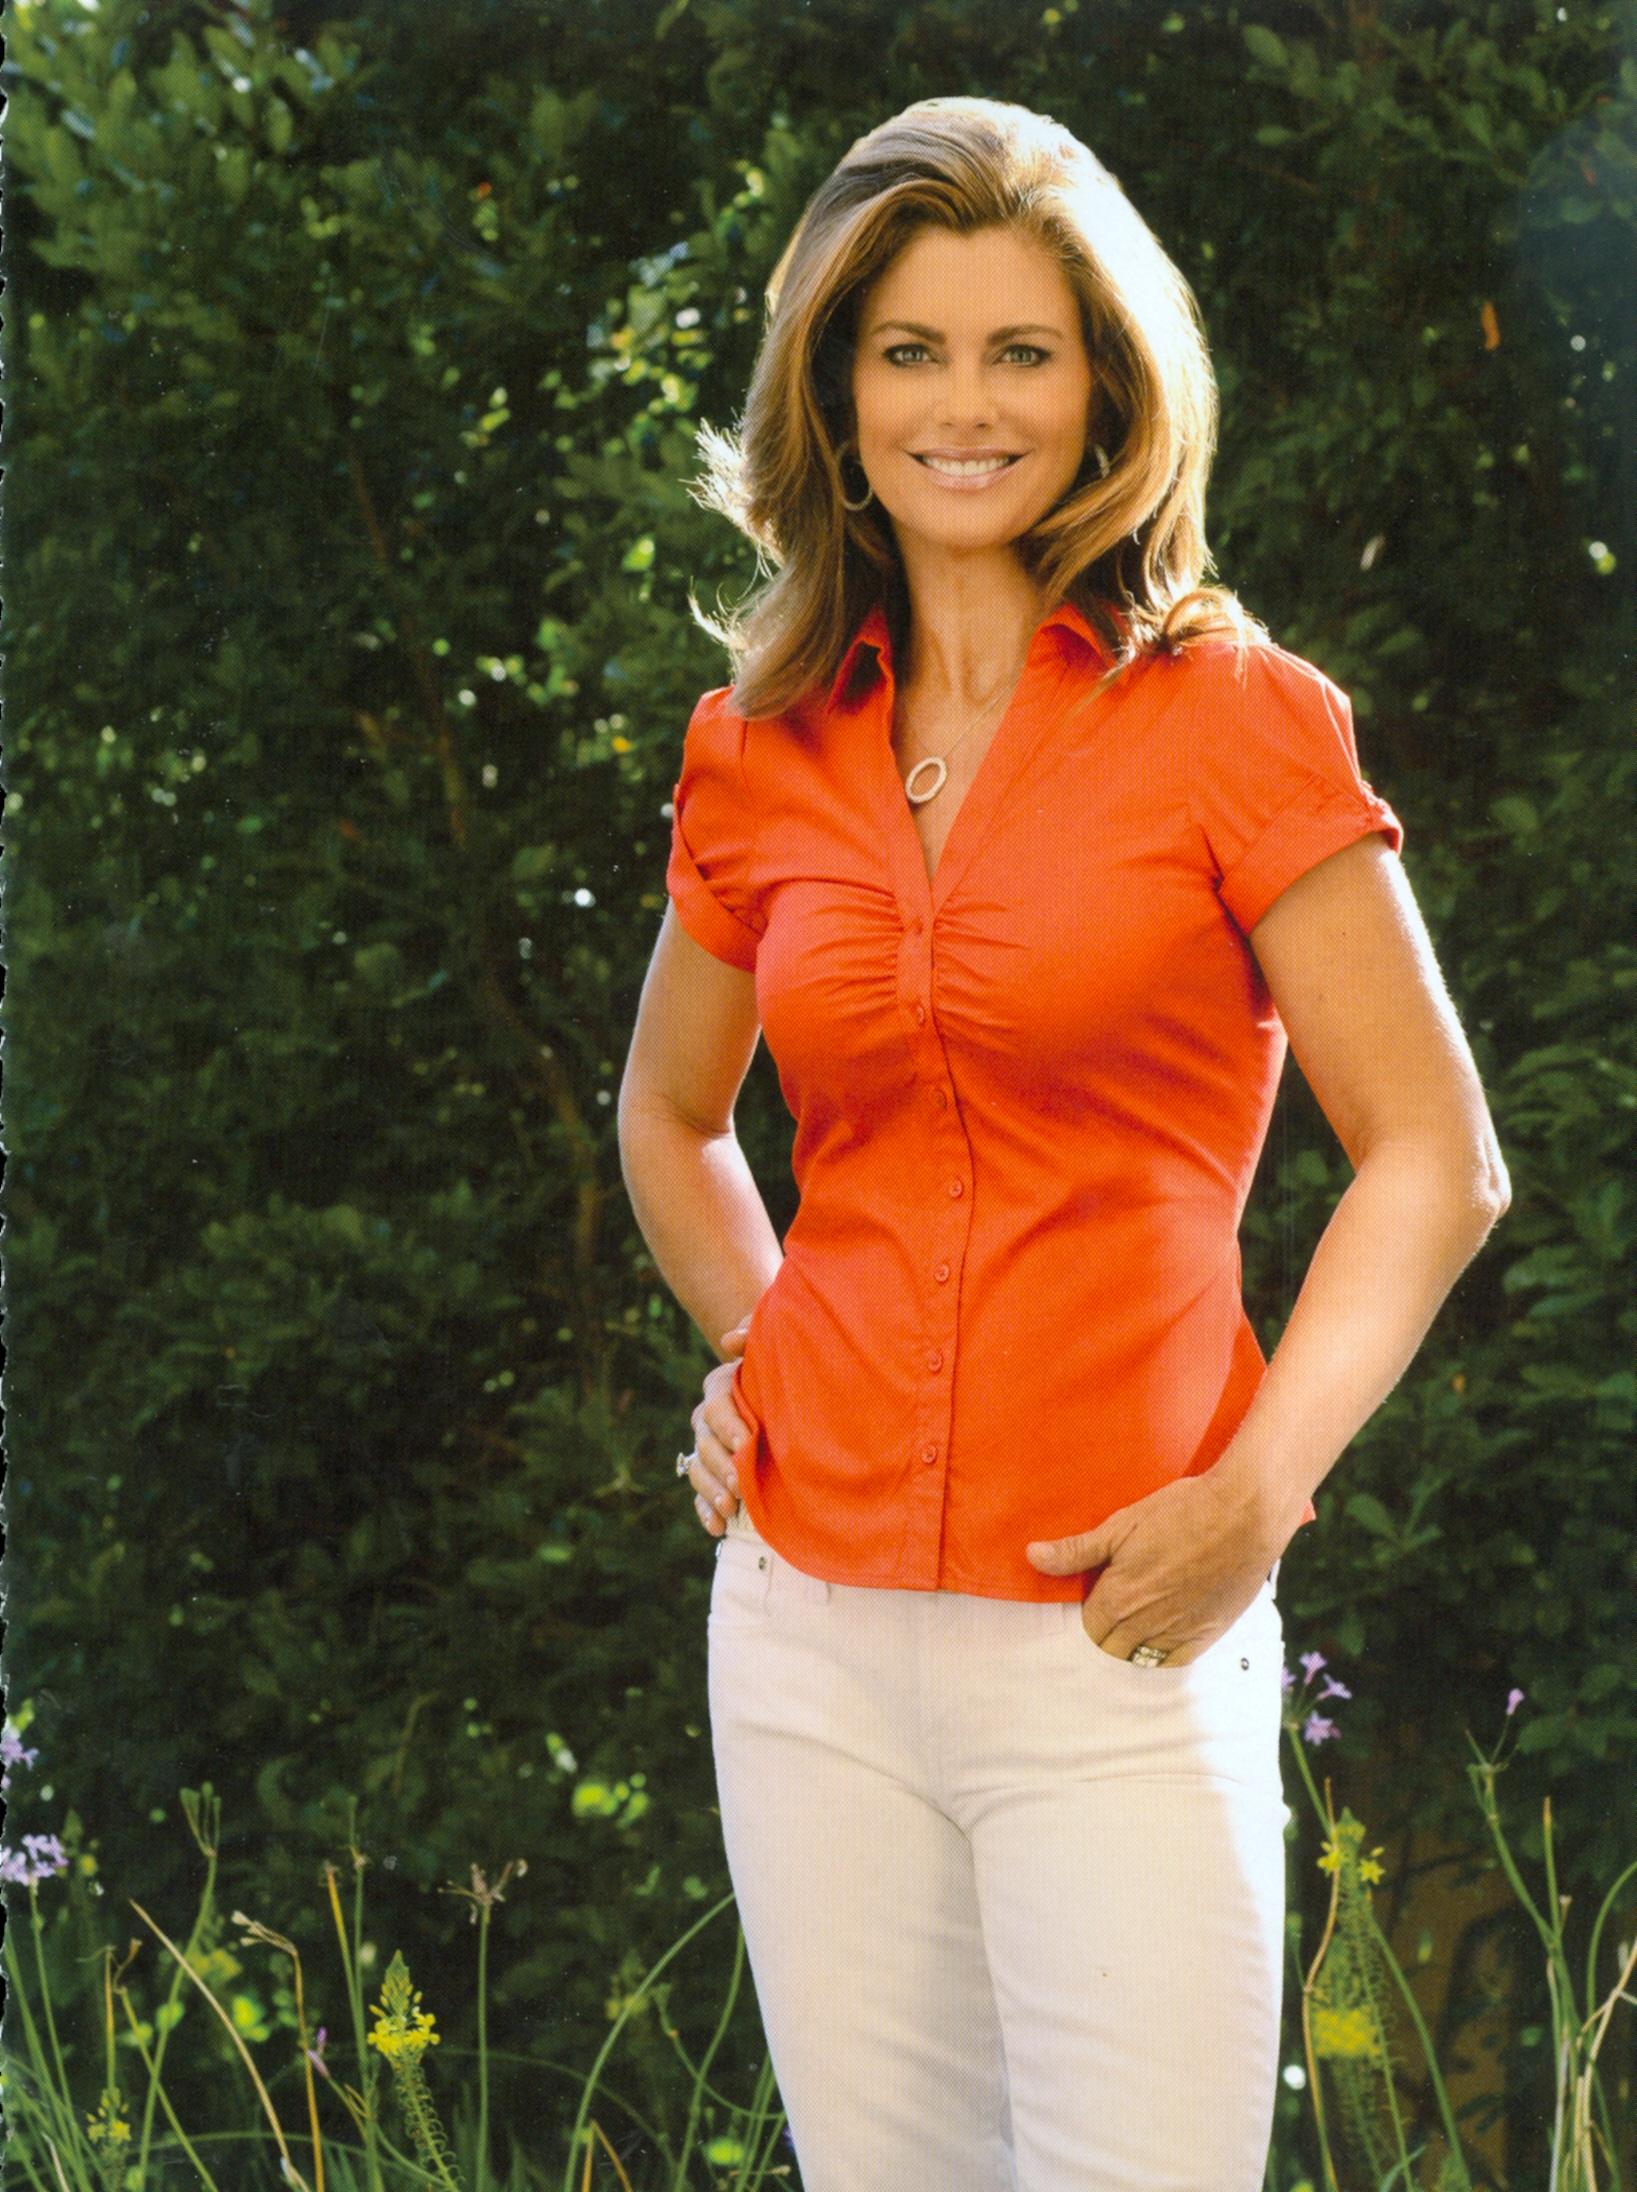 Kathy Ireland - Page 10 - Female Fashion Models - Bellazon